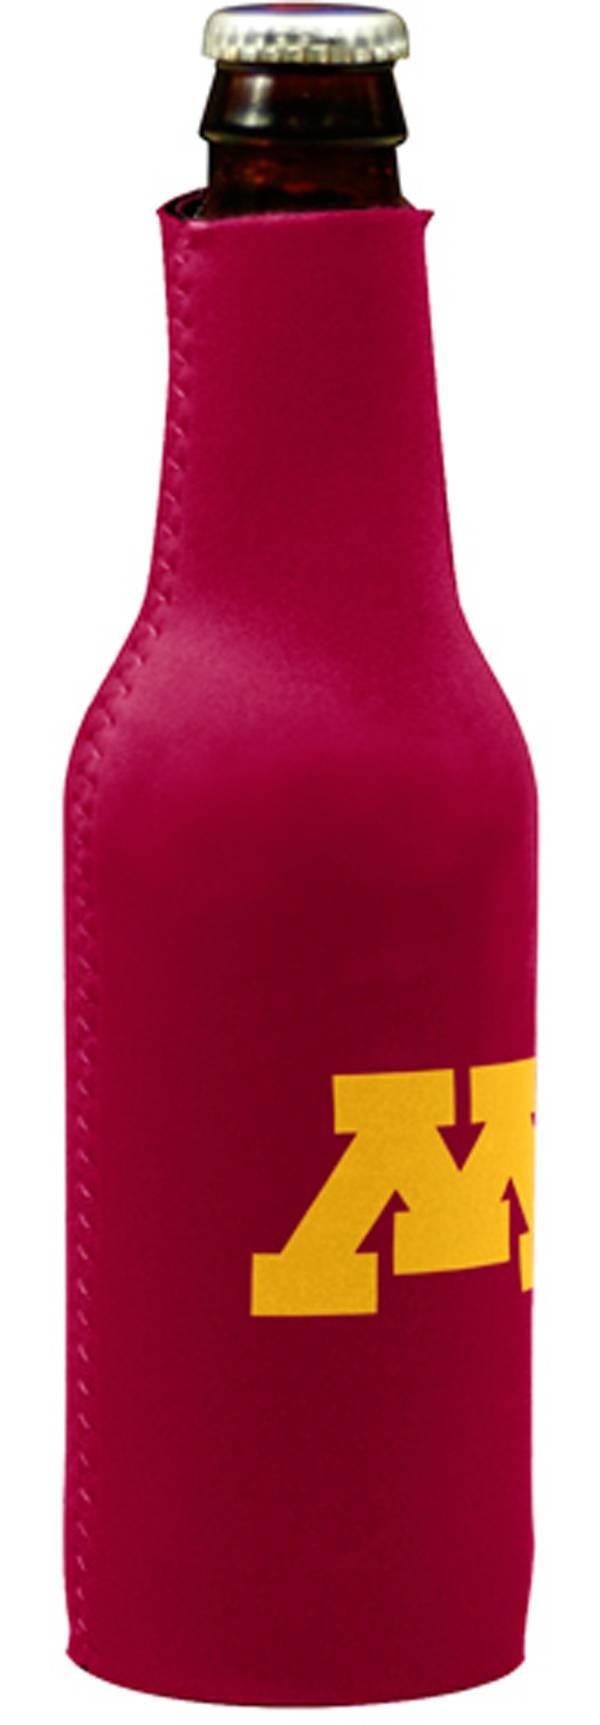 Minnesota Golden Gophers Bottle Koozie product image